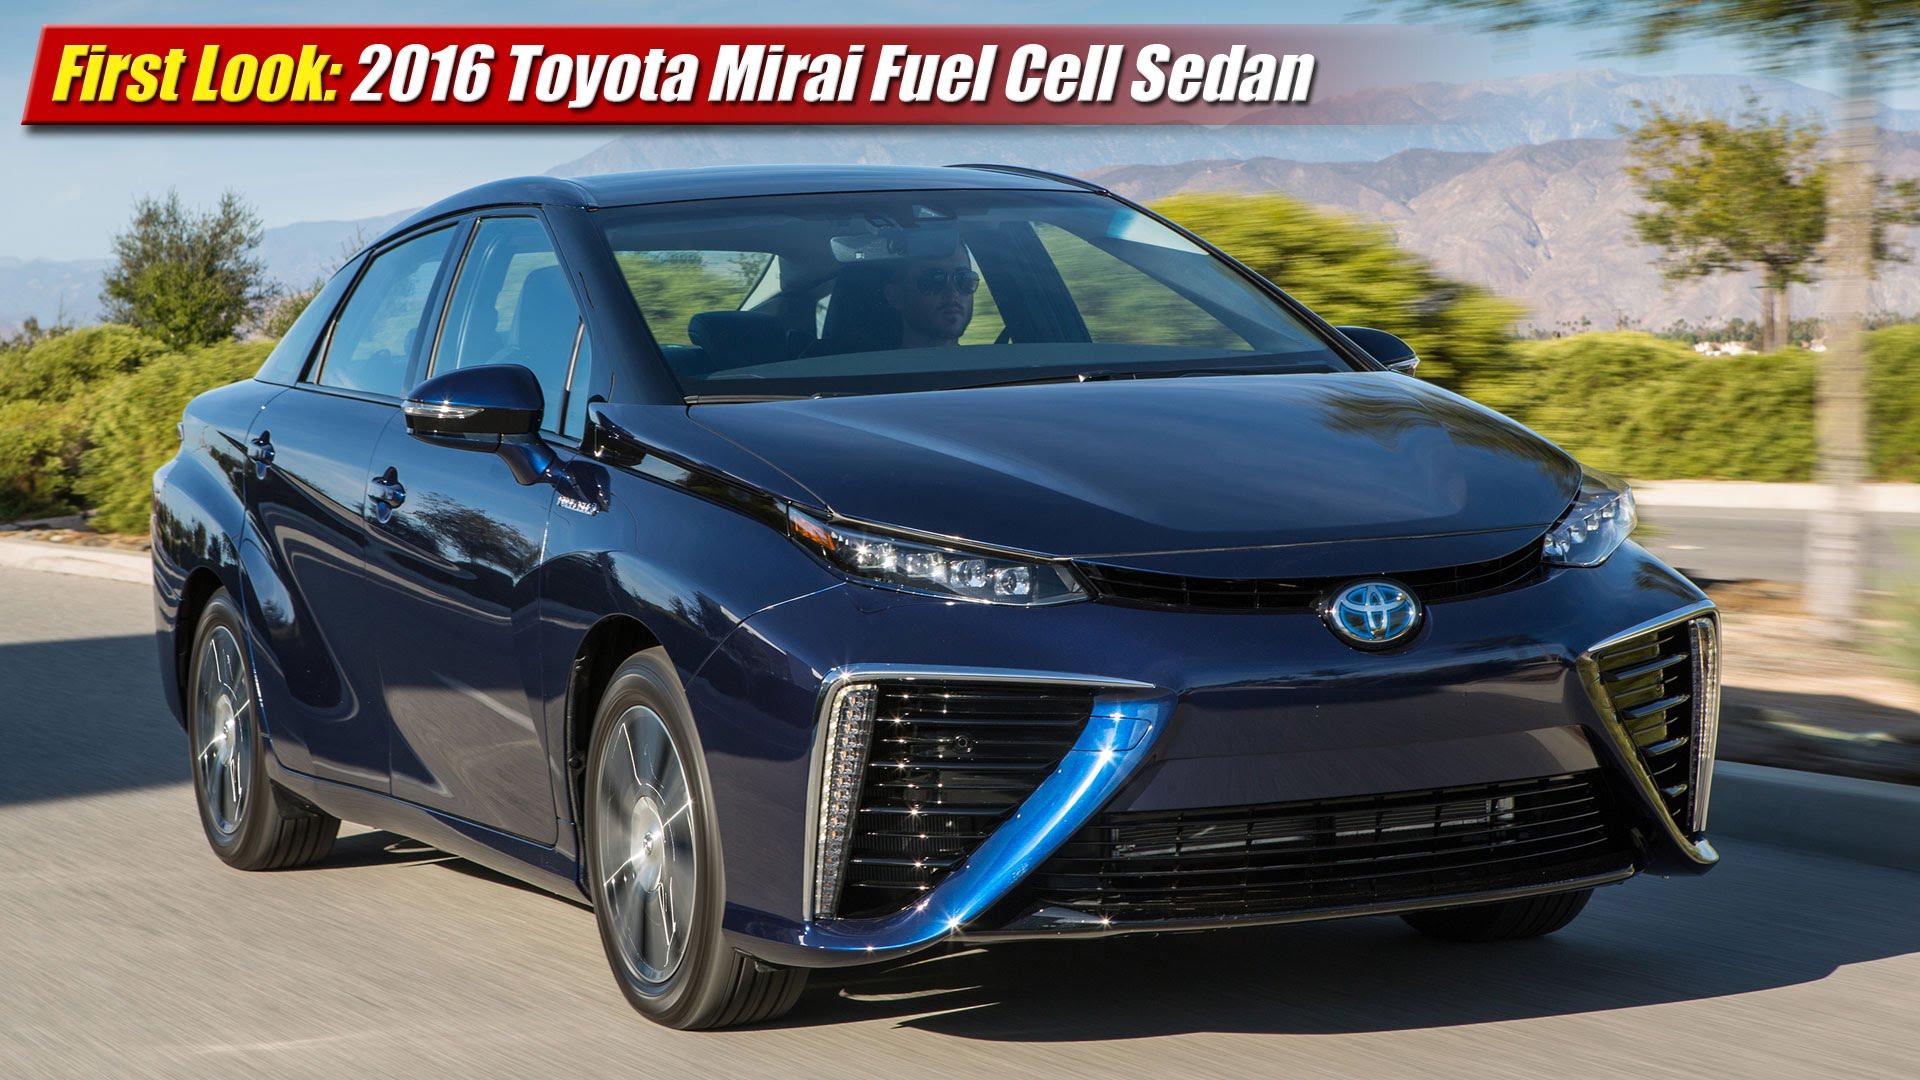 first look 2016 toyota mirai fuel cell sedan   testdriven tv